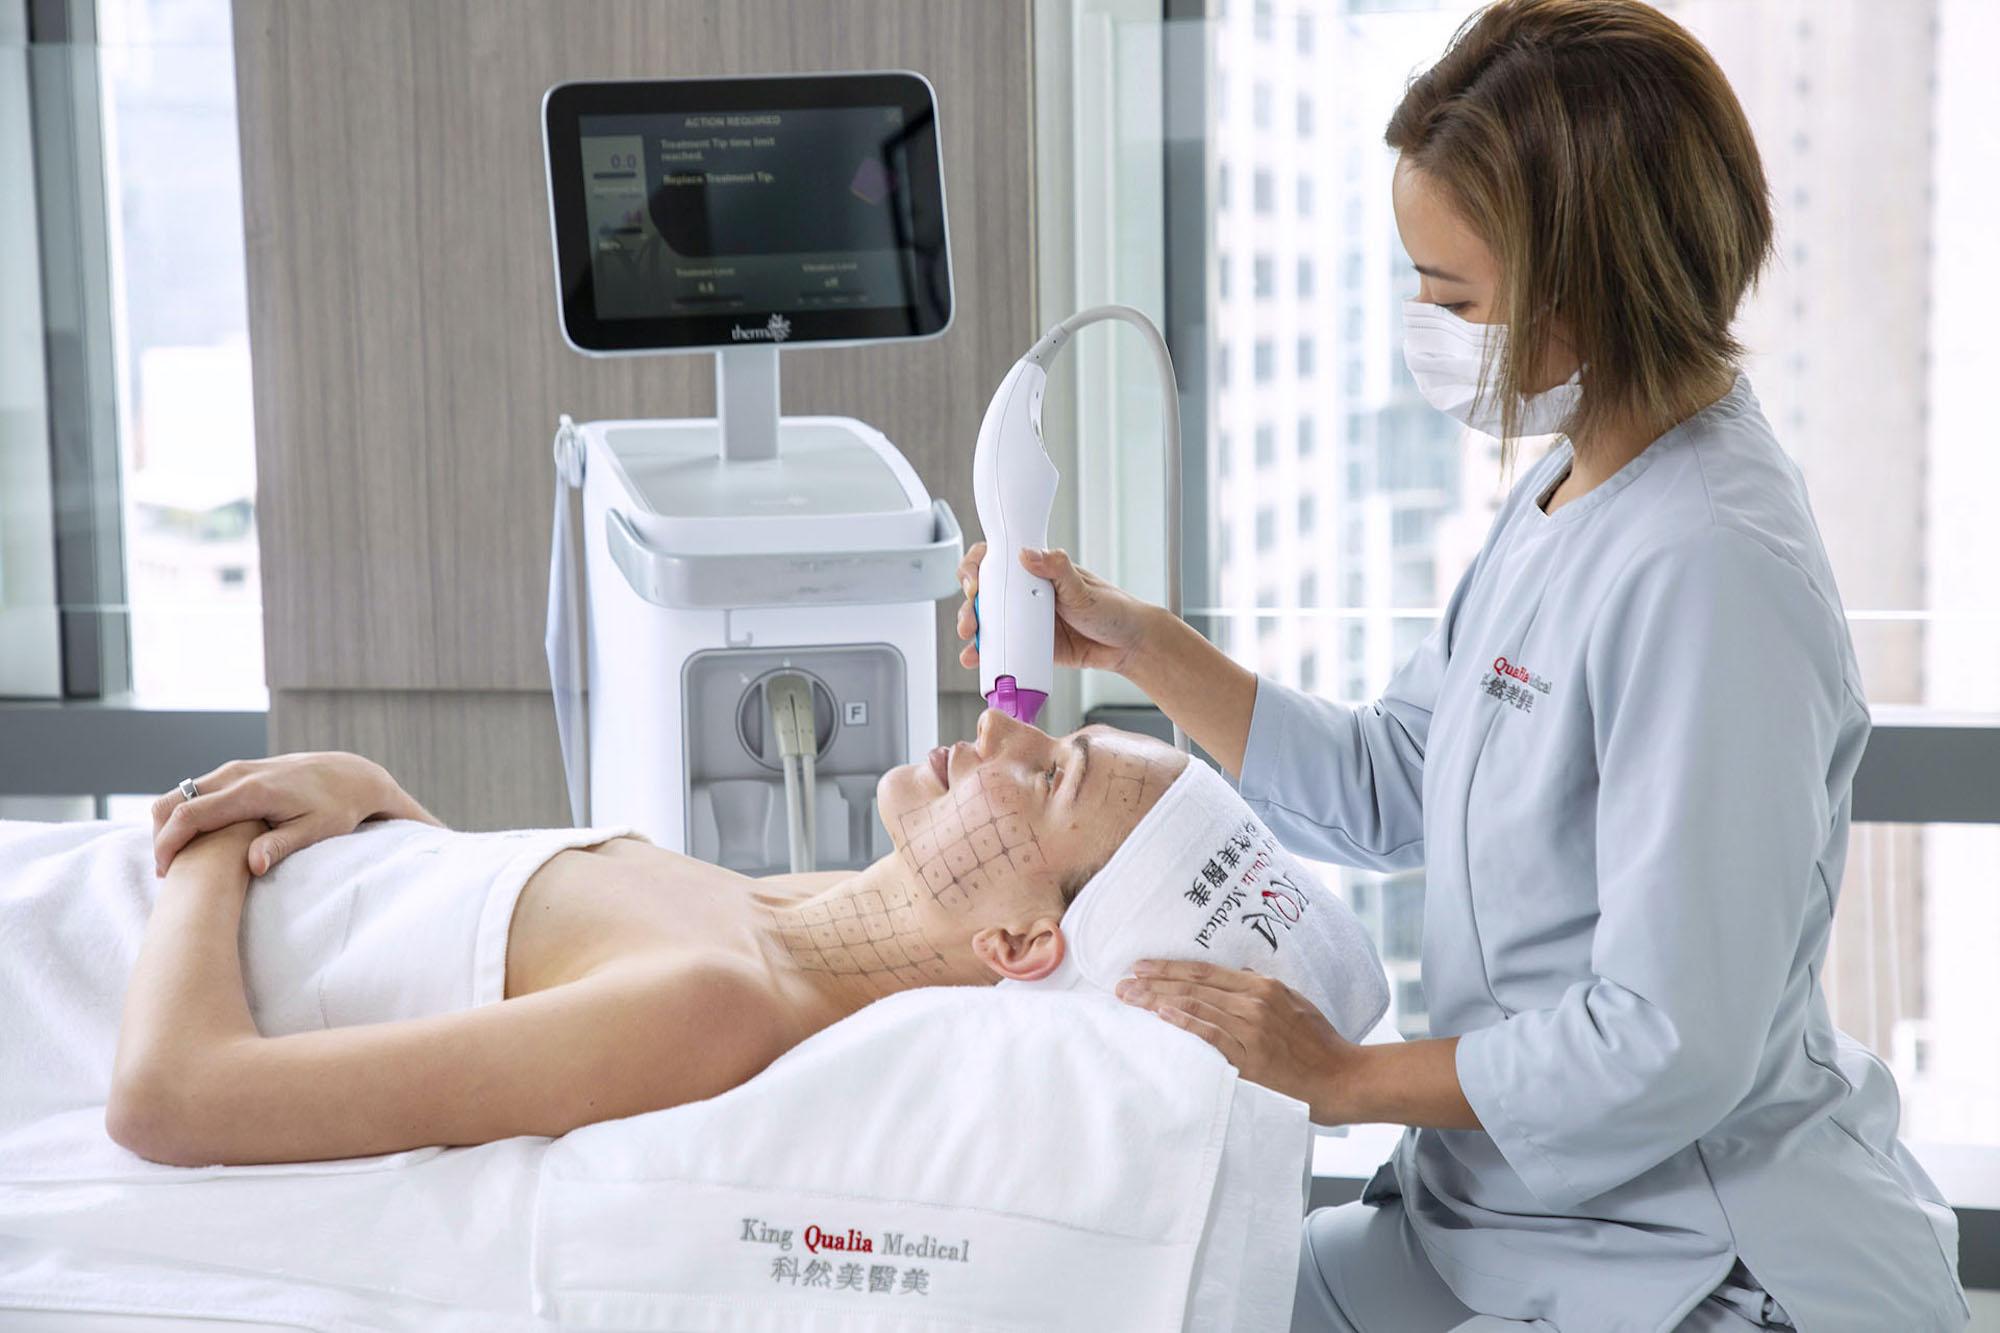 king qualia beauty centre non invasive procedures treatments